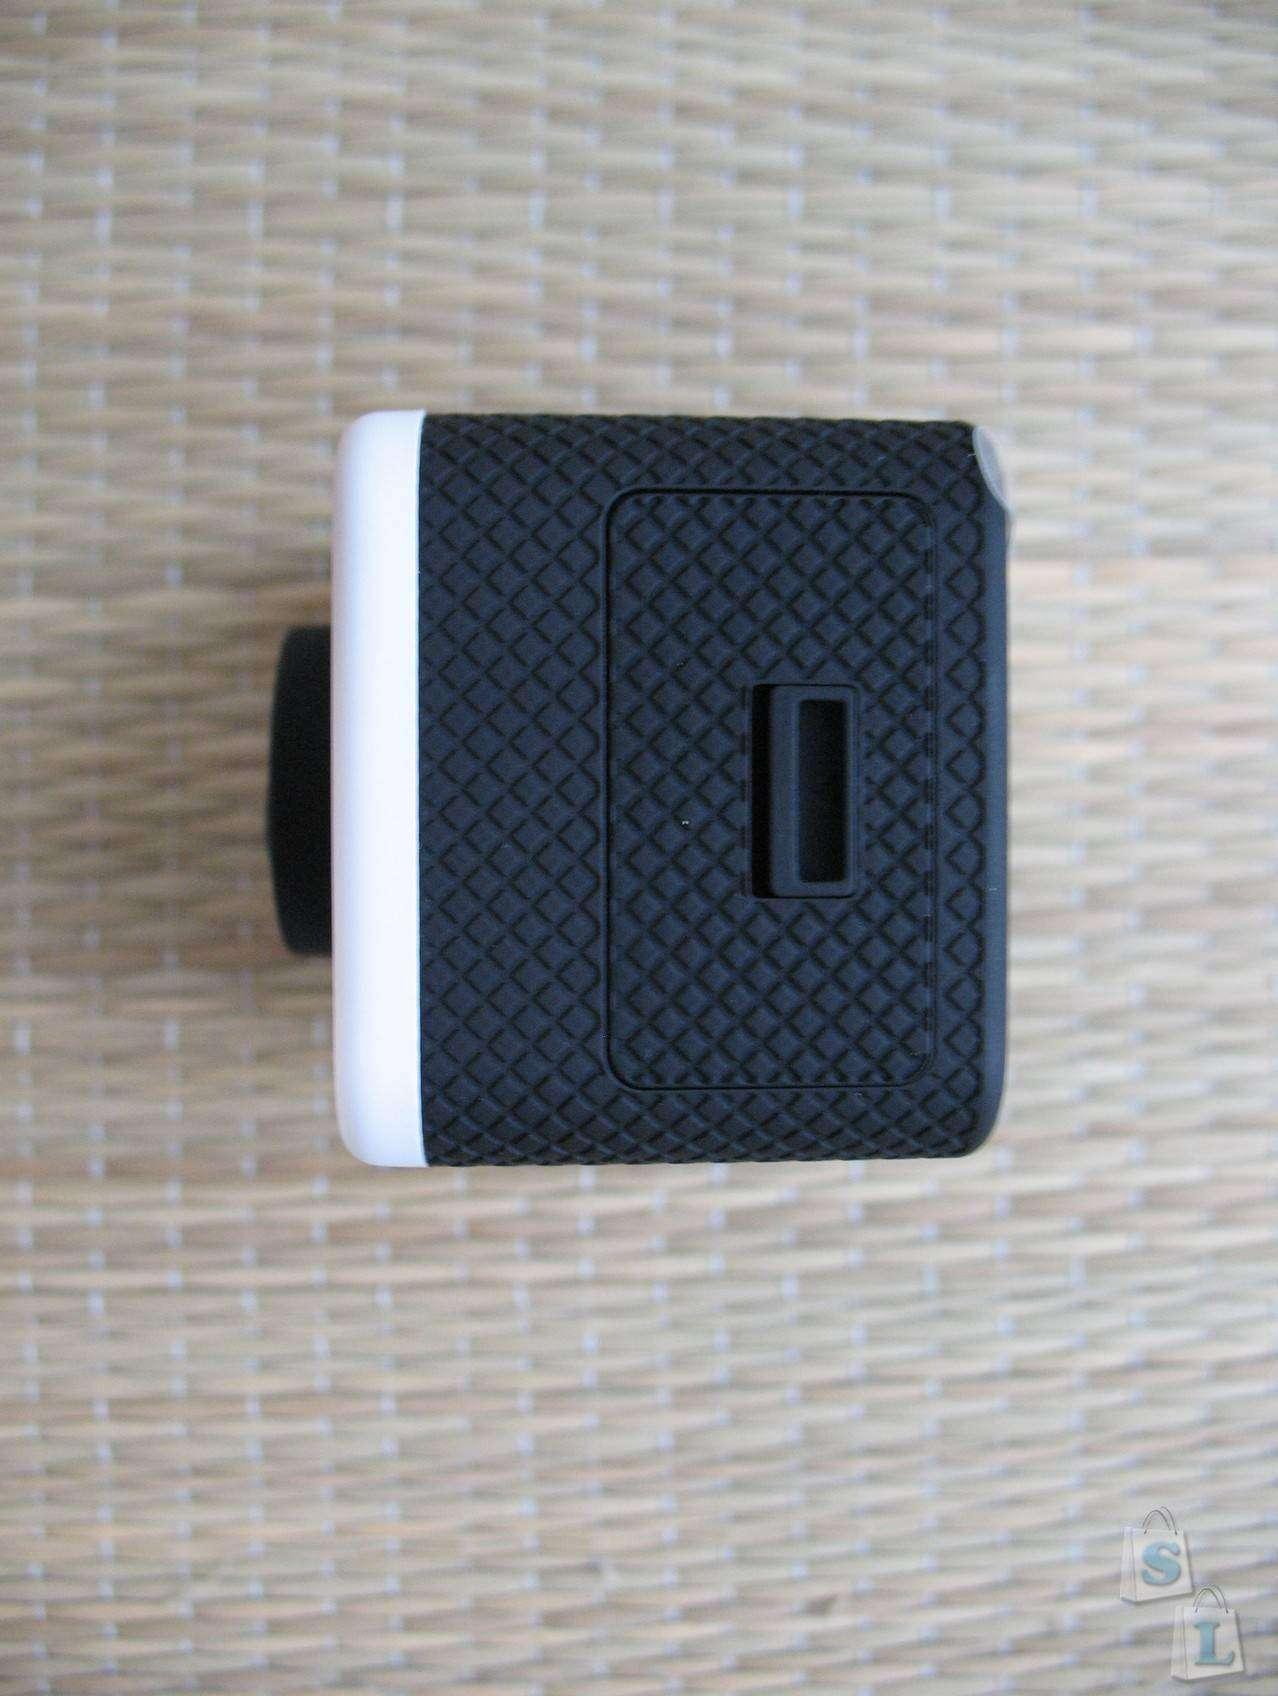 Tmart: Обзор экшн-камеры SJCAM M10+